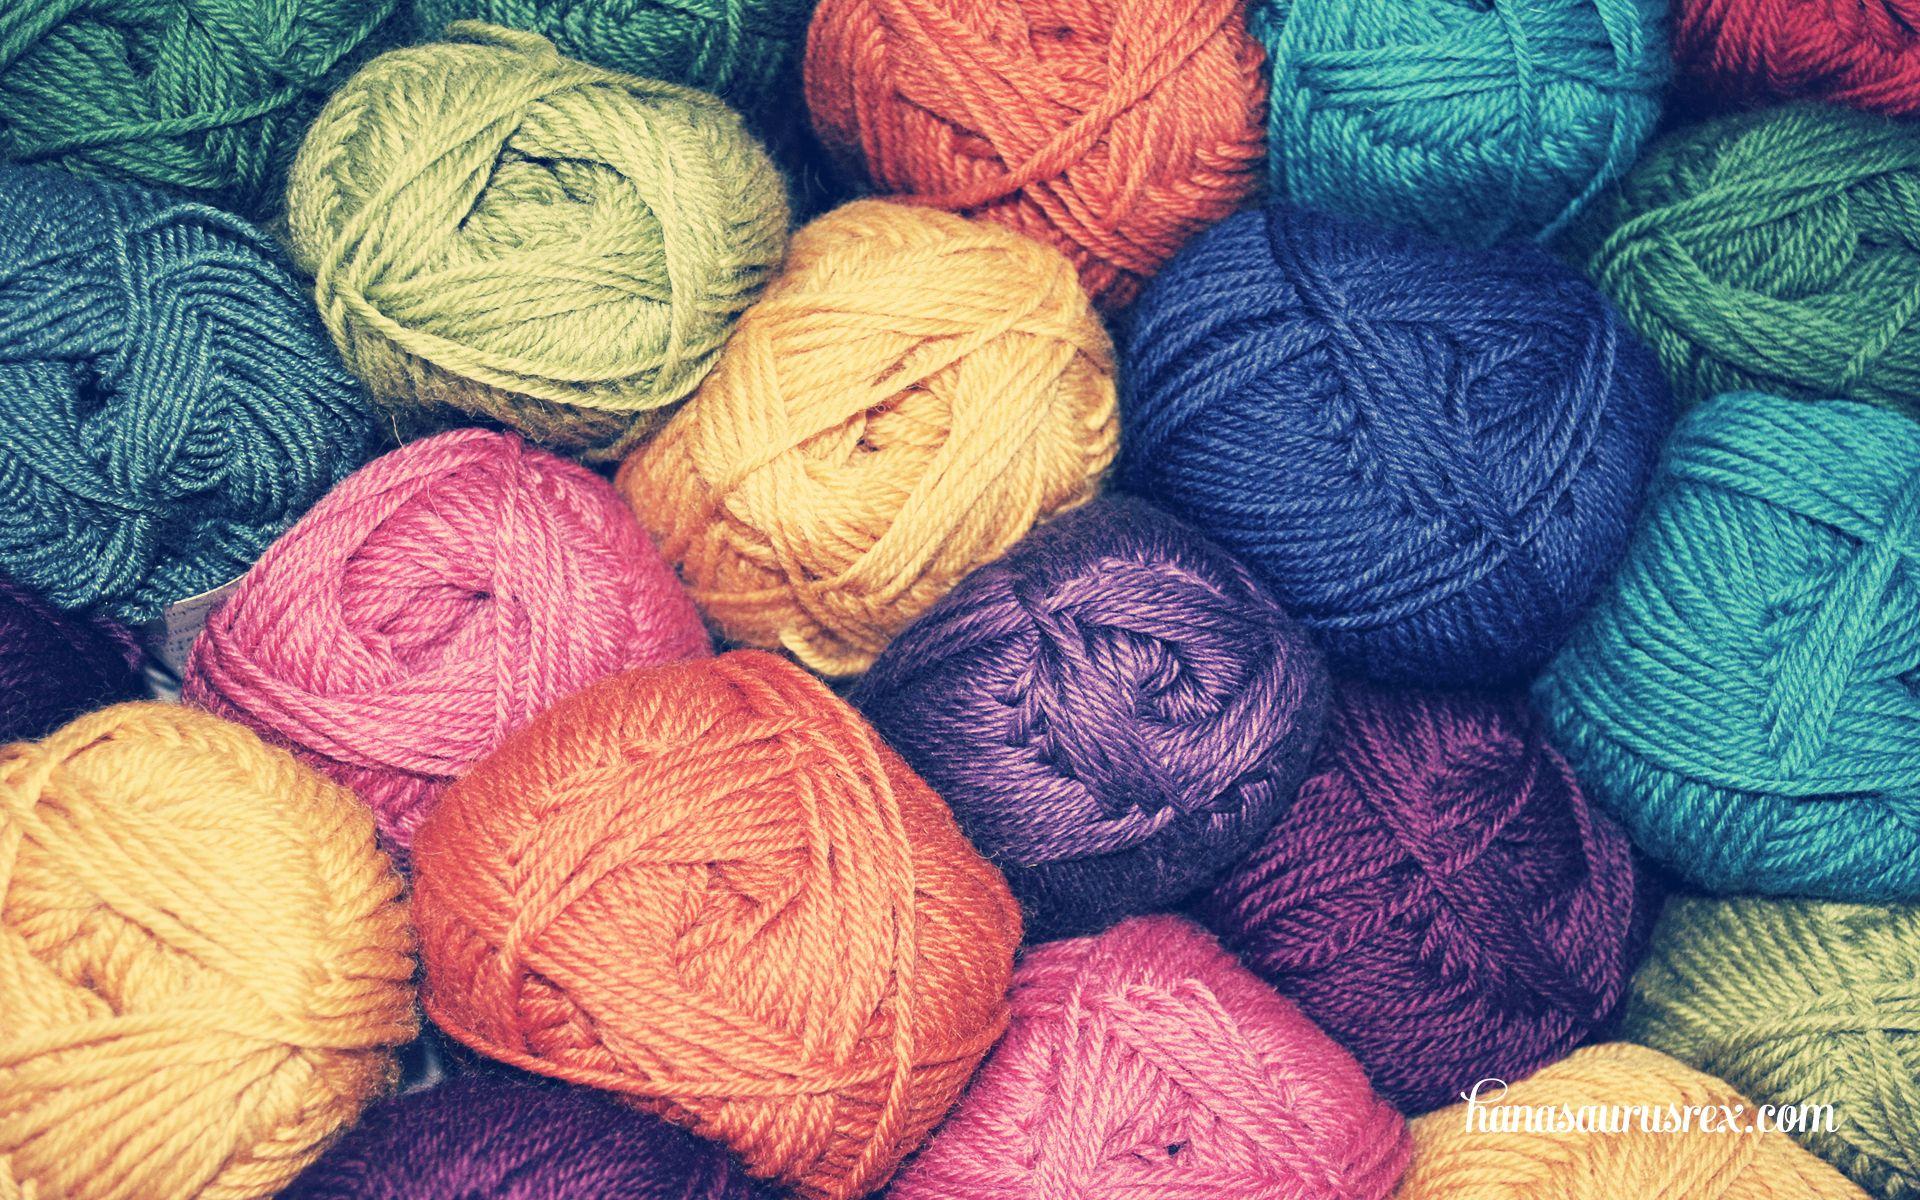 Yarn Hanasaurusrex Rawr Yarn Free Desktop Wallpaper Wool Crafts Yarn Colors Yarn